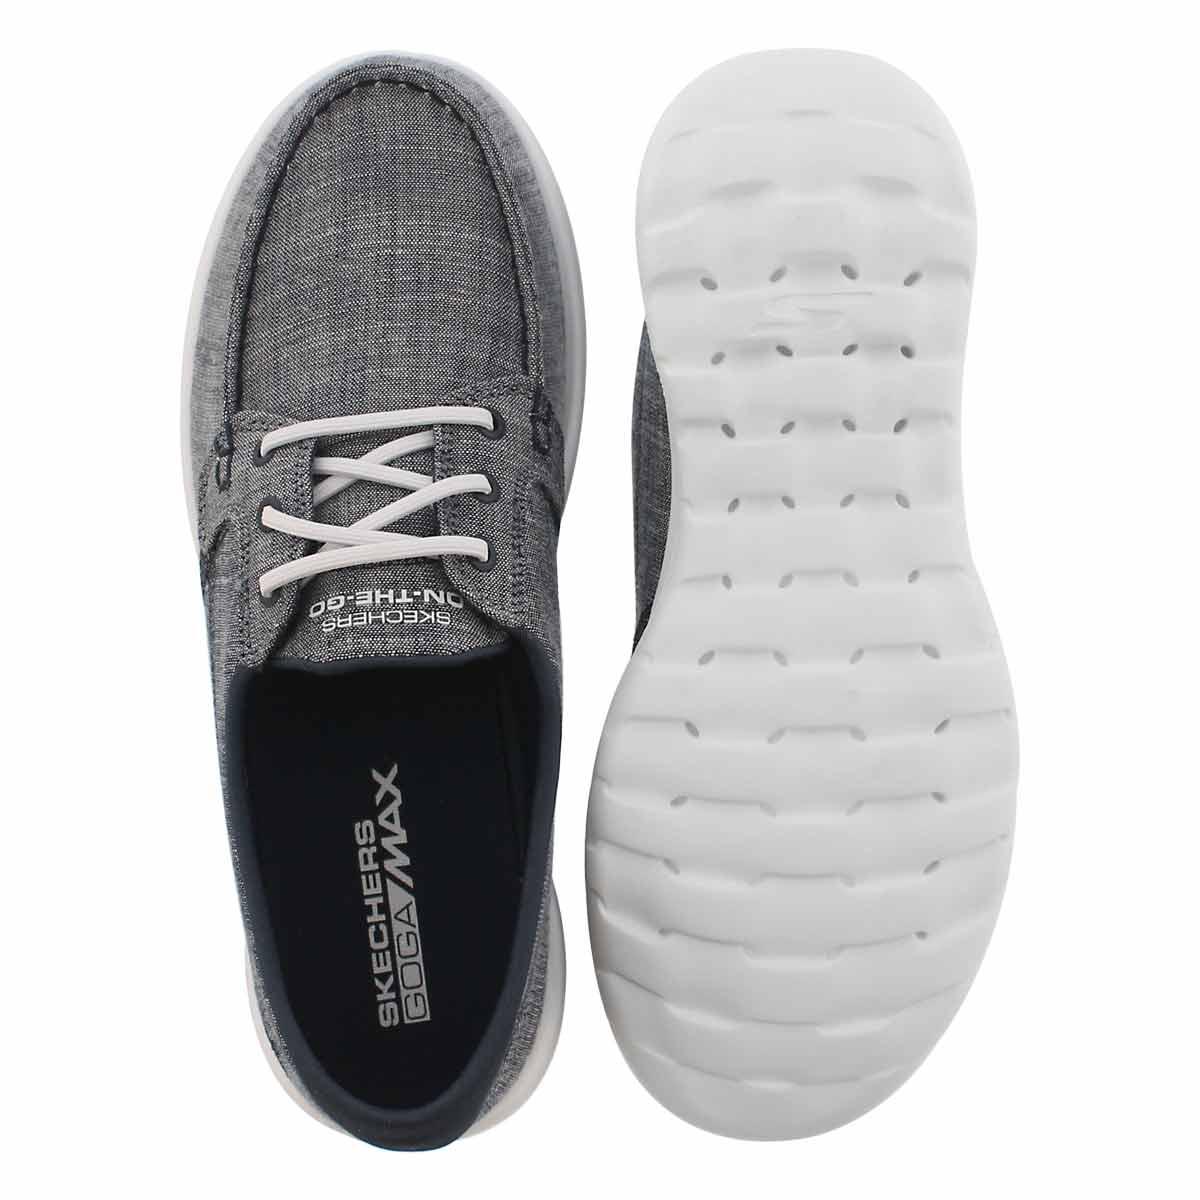 Lds GO Walk Lite navy boat shoe